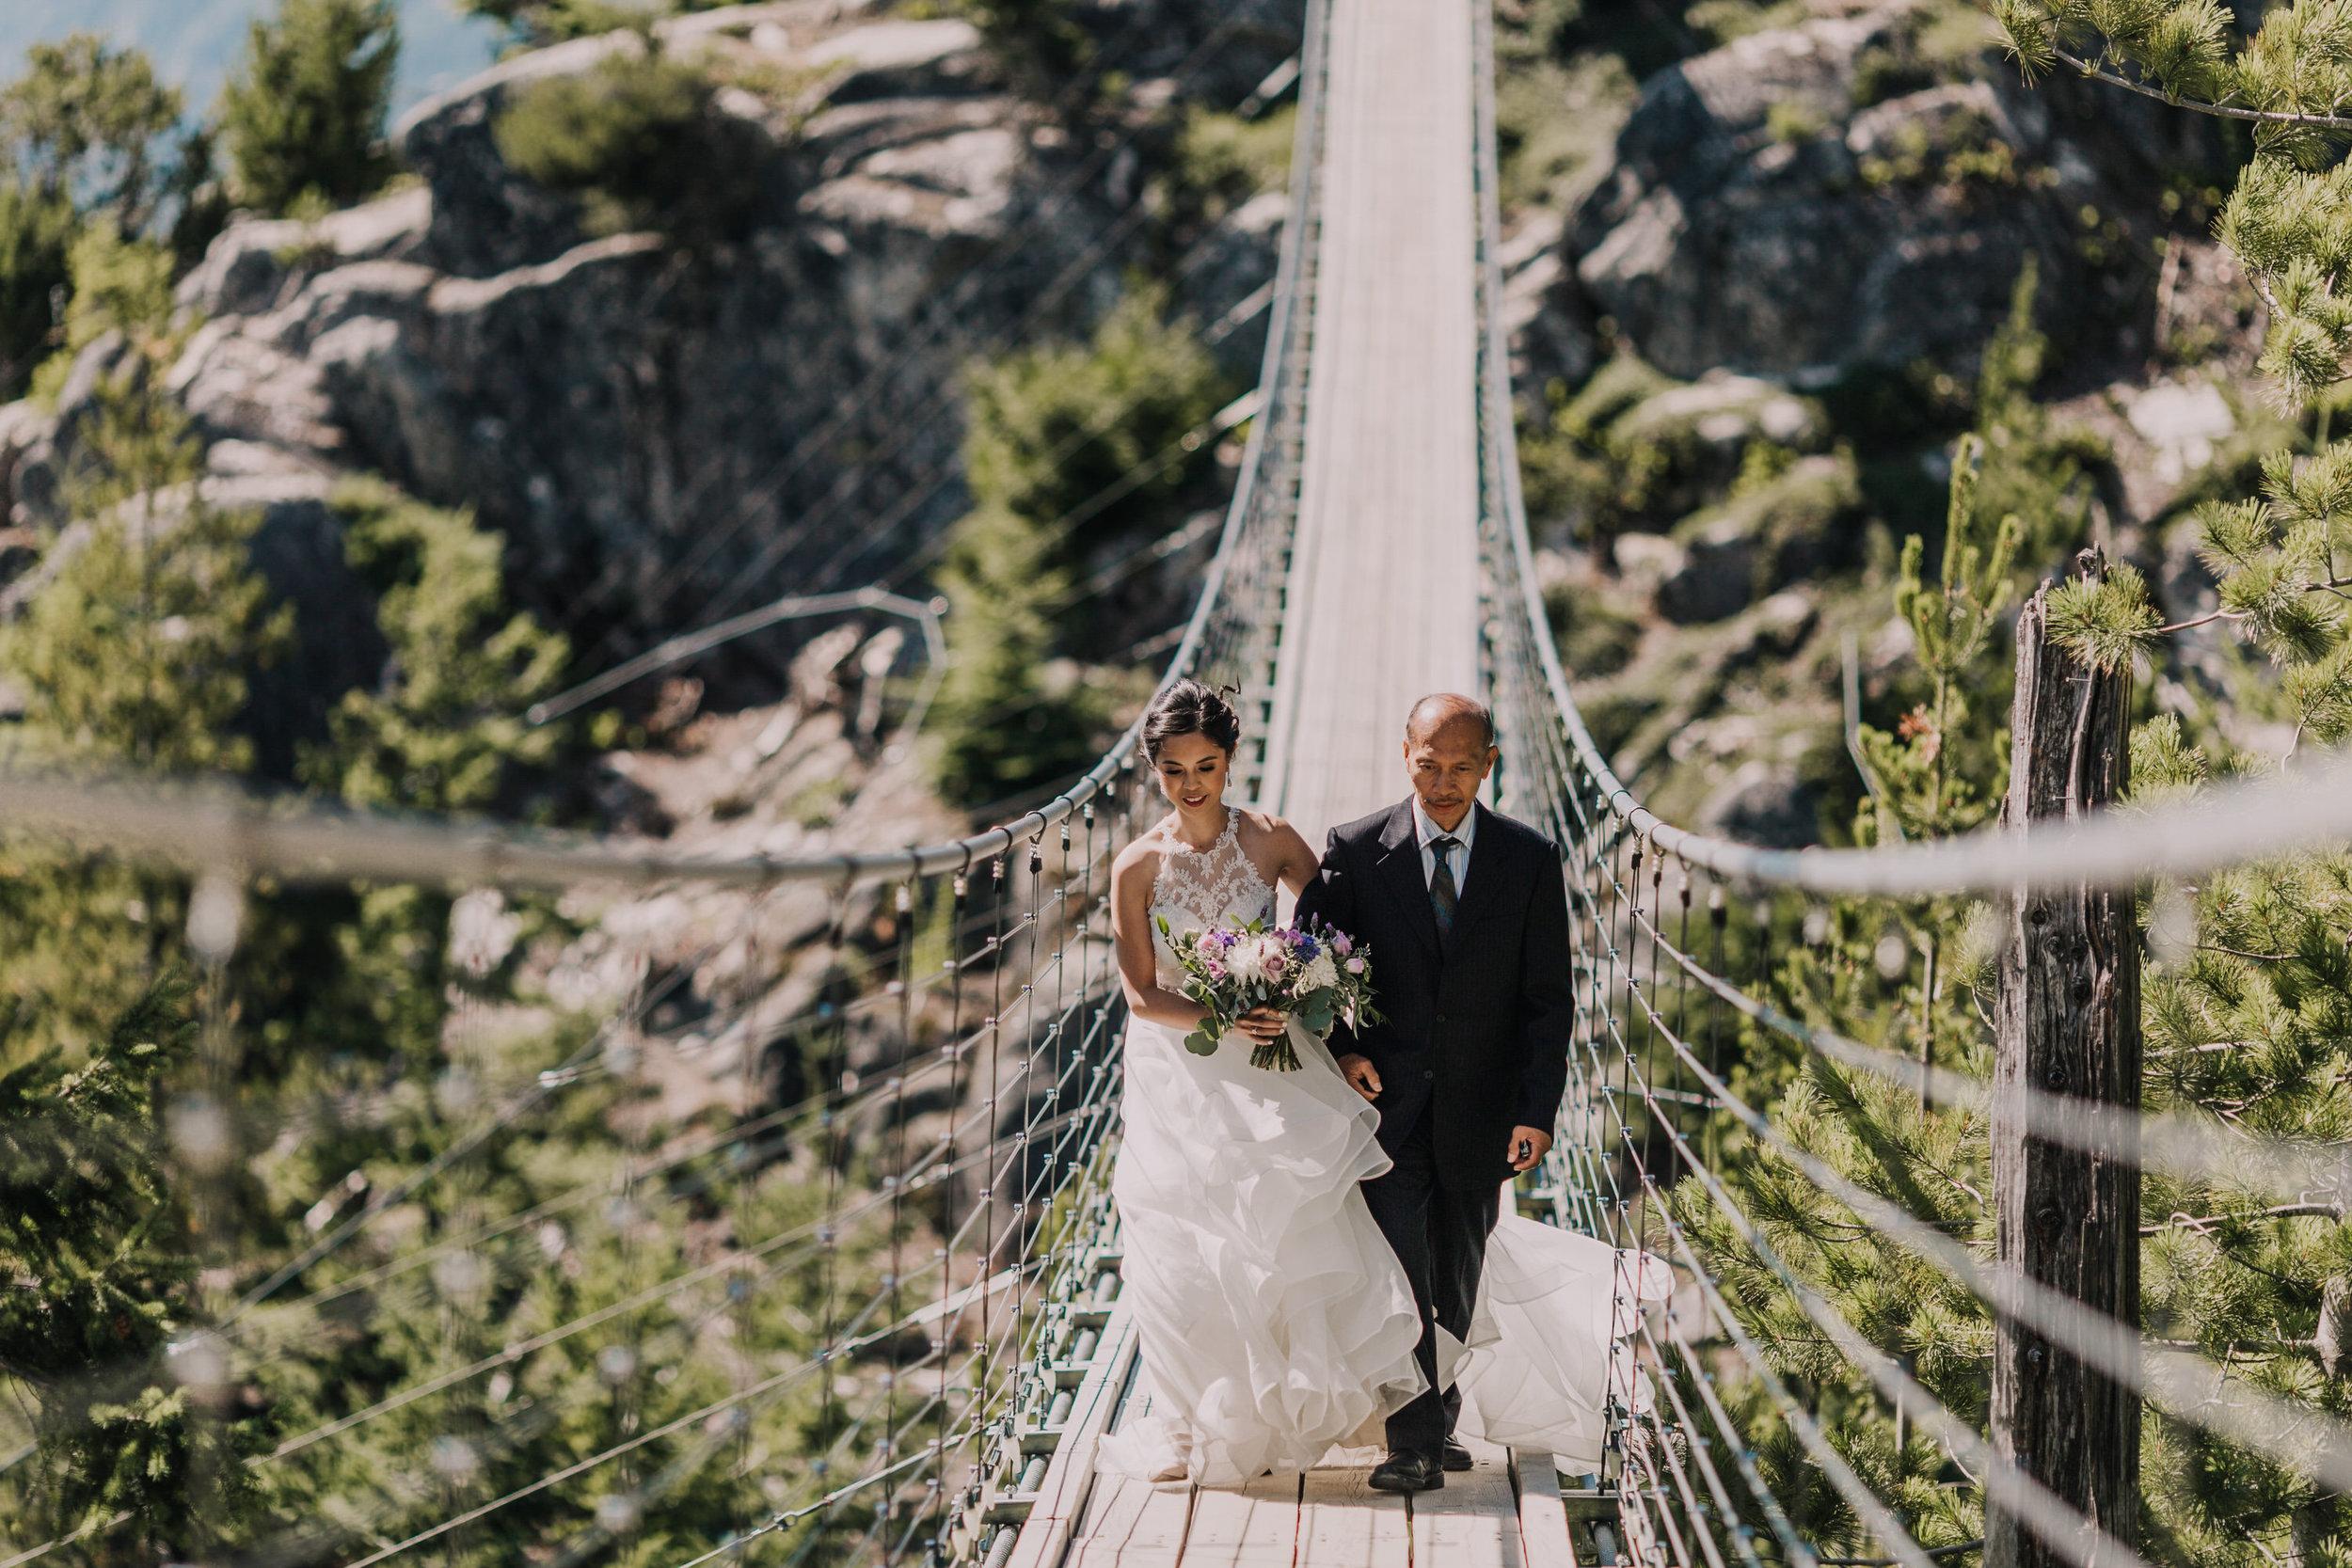 Squamish Wedding Photographer - Sea to Sky Gondola Wedding Photos -  Vancouver Wedding Photographer & Videographer - Sunshine Coast Wedding Photos - Sunshine Coast Wedding Photographer - Jennifer Picard Photography - IMG_0150.jpg